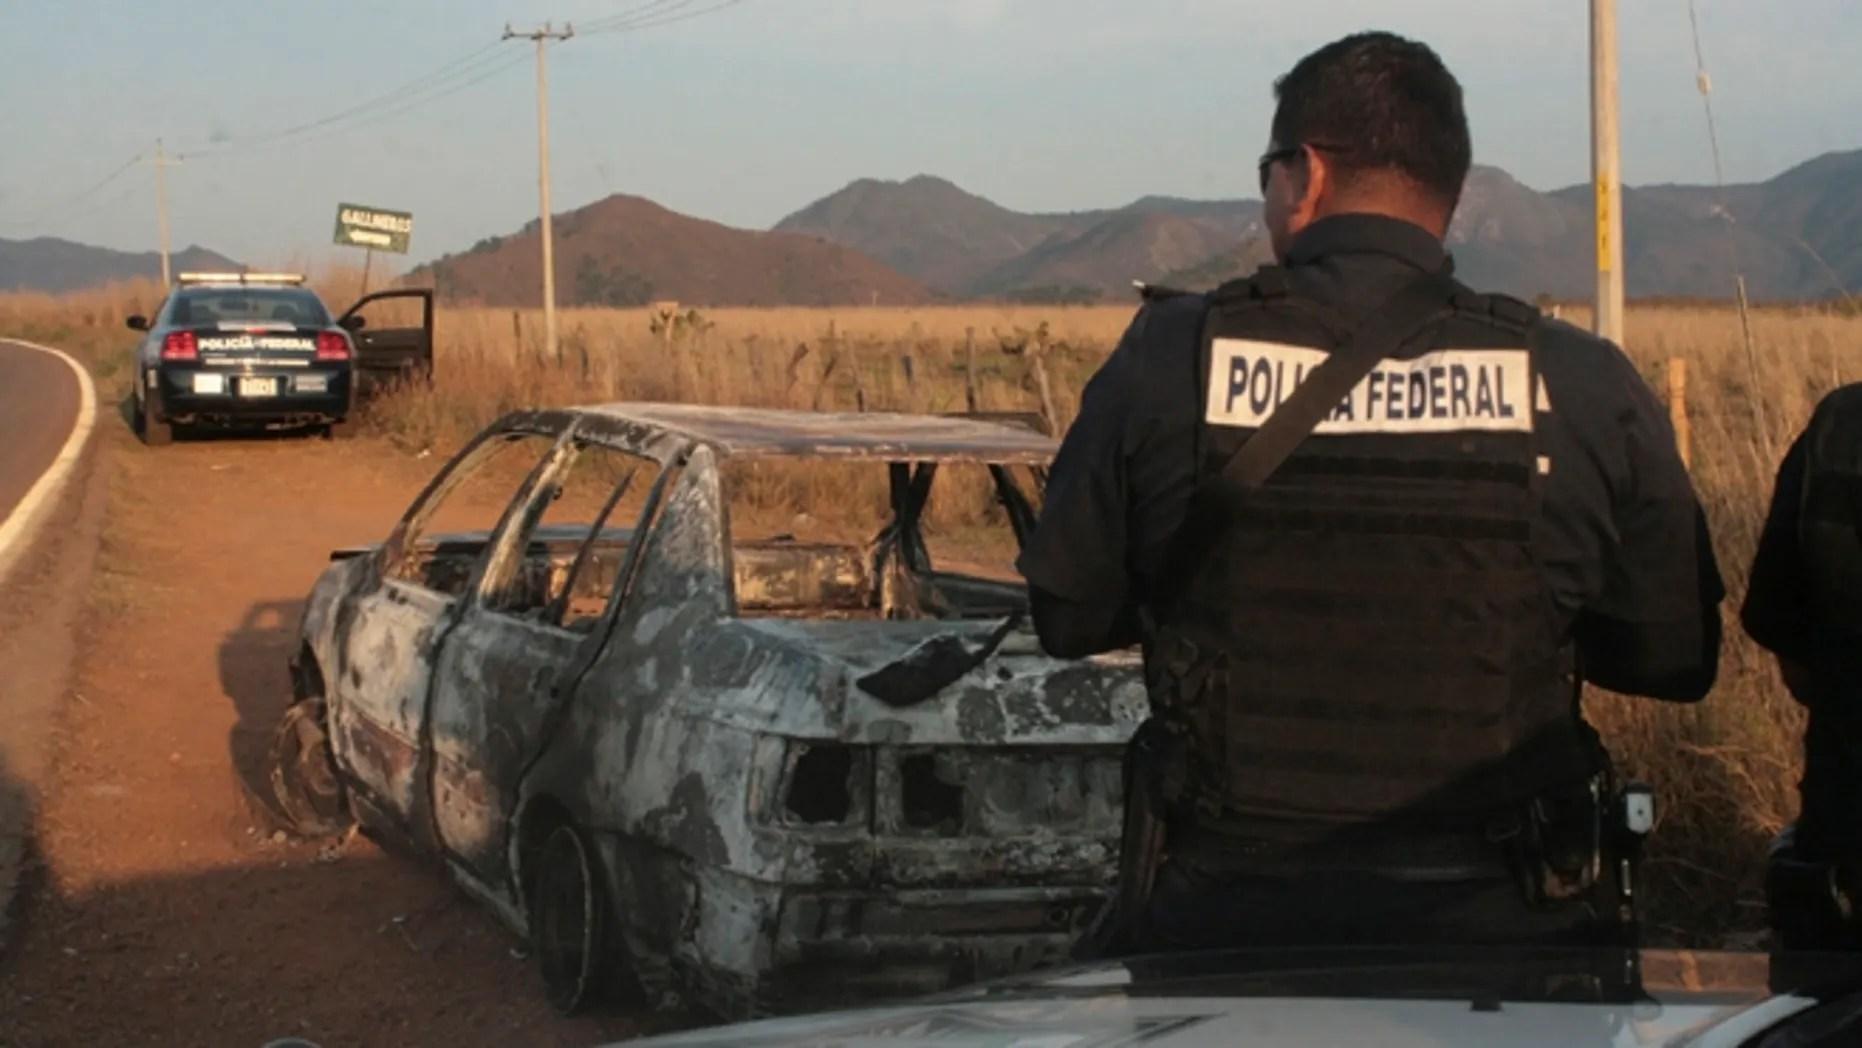 Drug Cartel Spate Of Violence U.-mexico